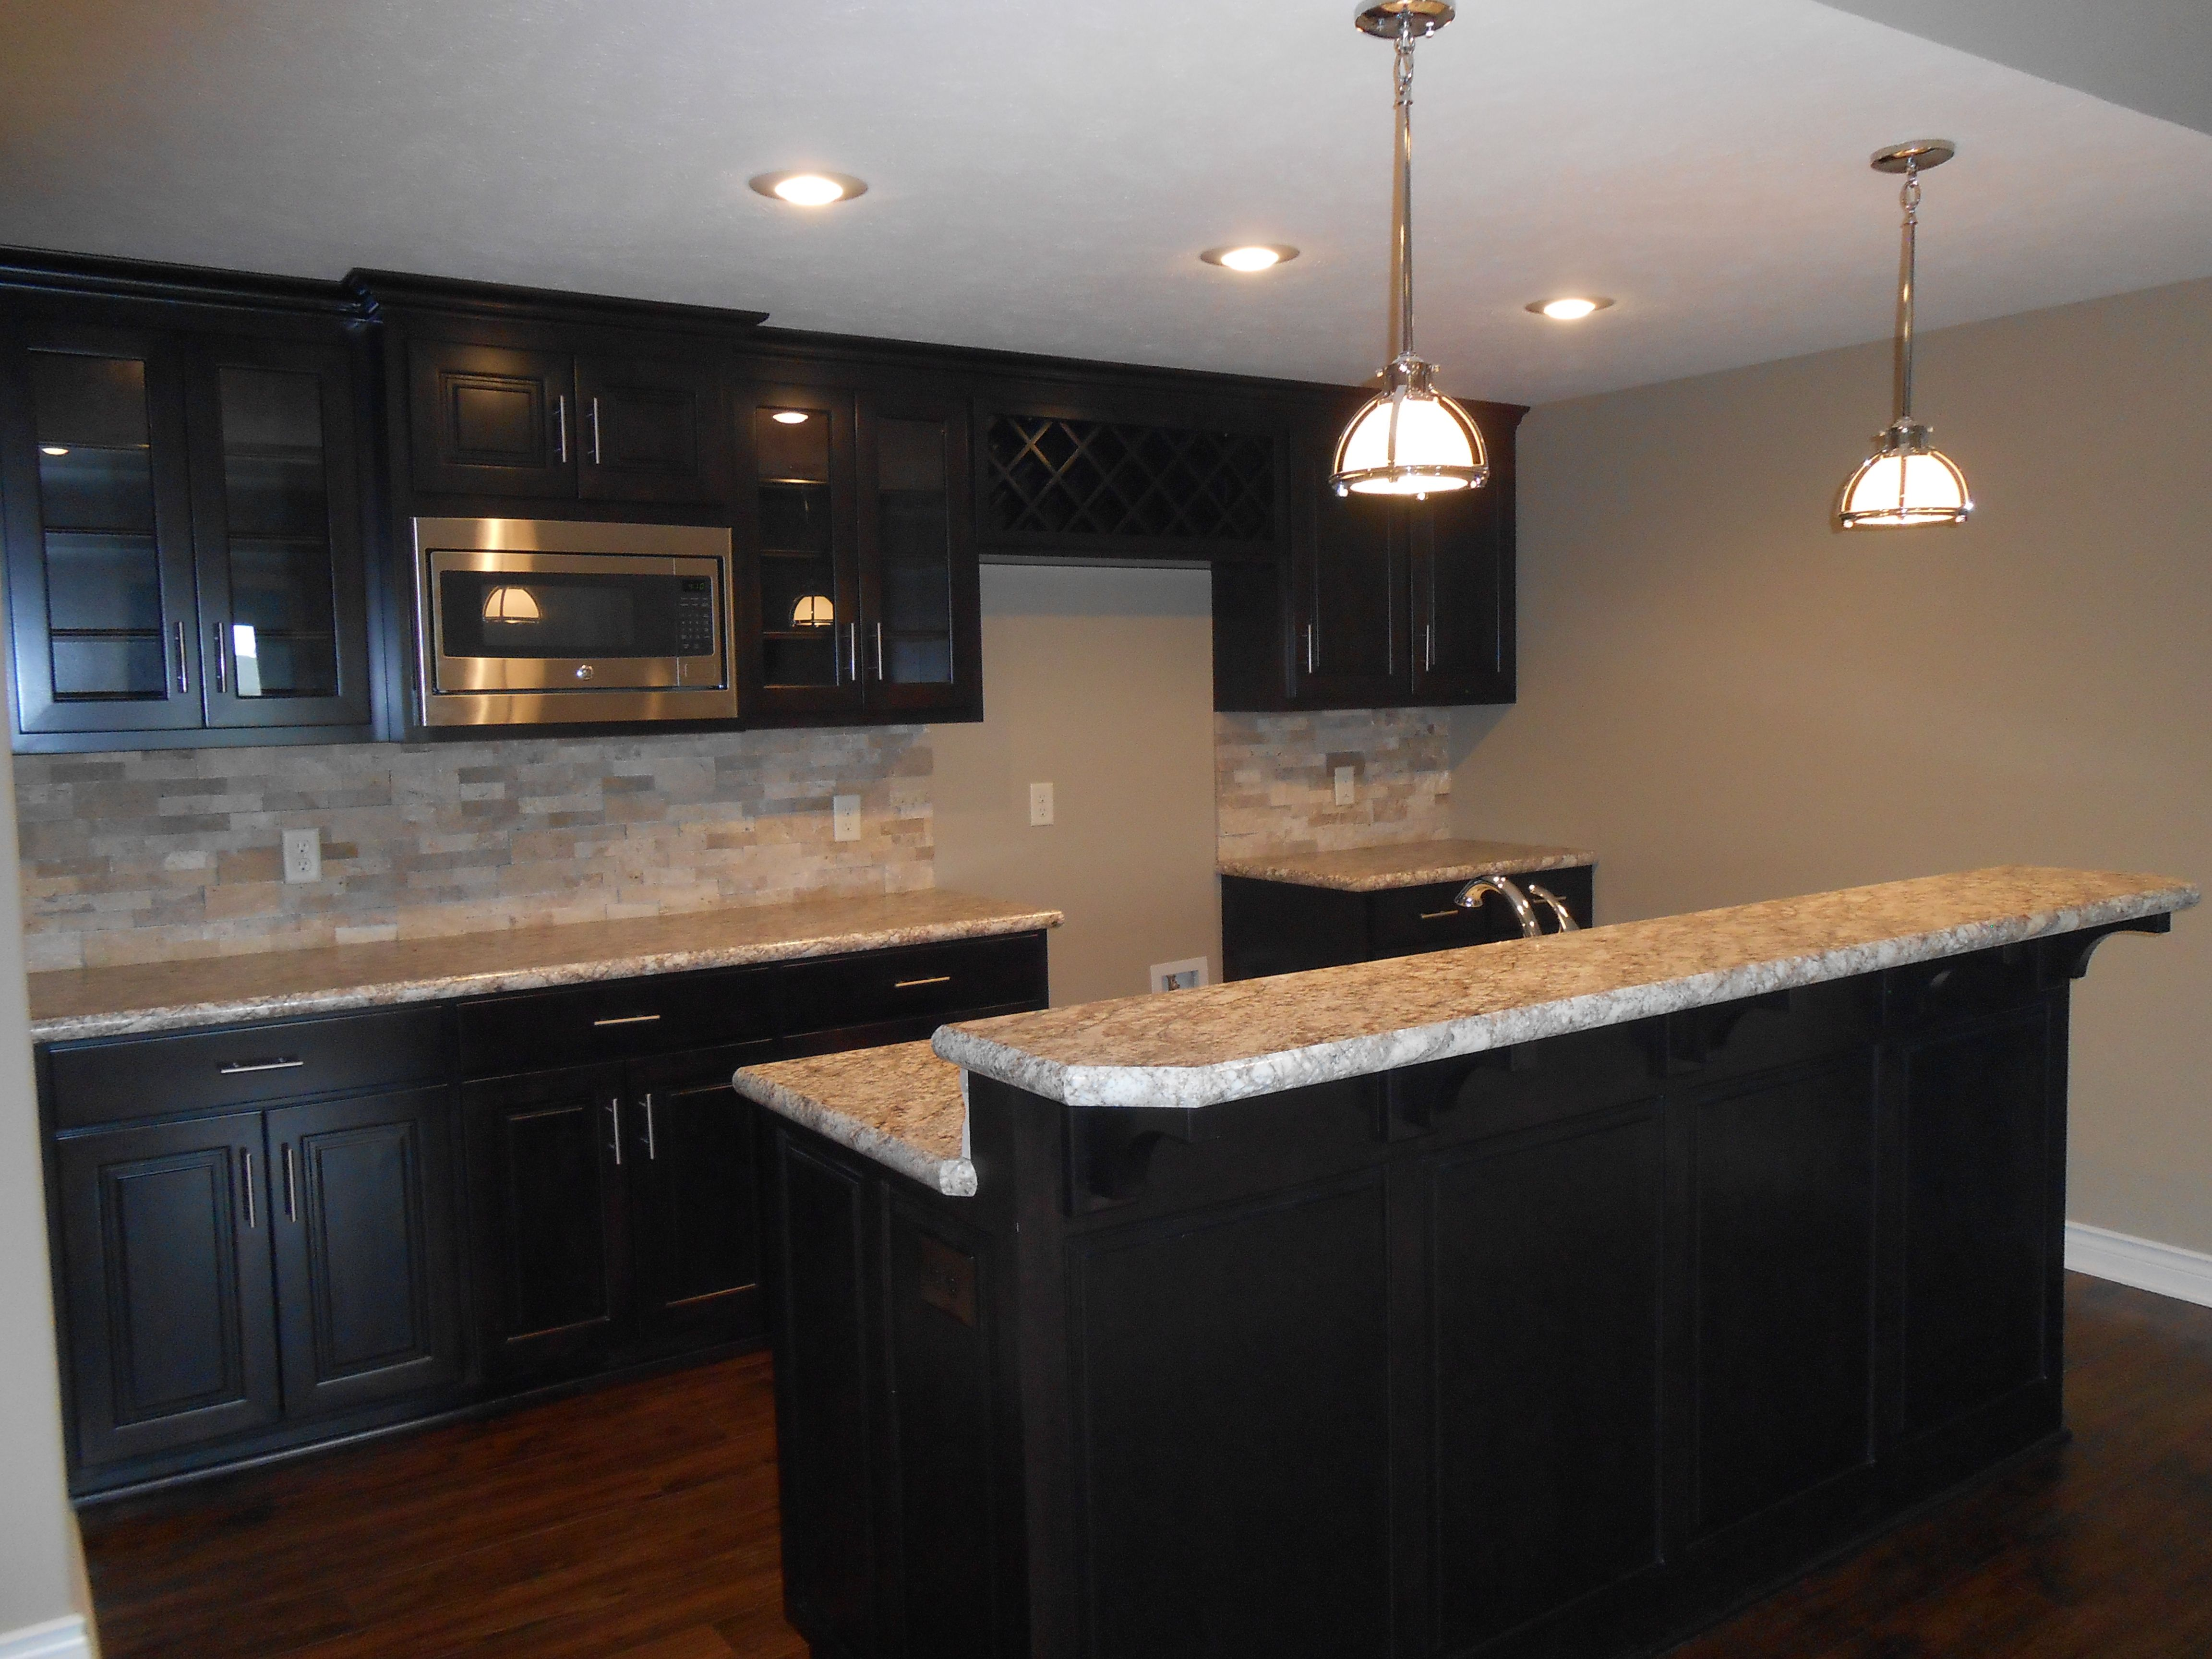 Beau Vencil Homes   Wilsonart HD #laminate On The Bar Tops. Natural Stone Ledger  Panel